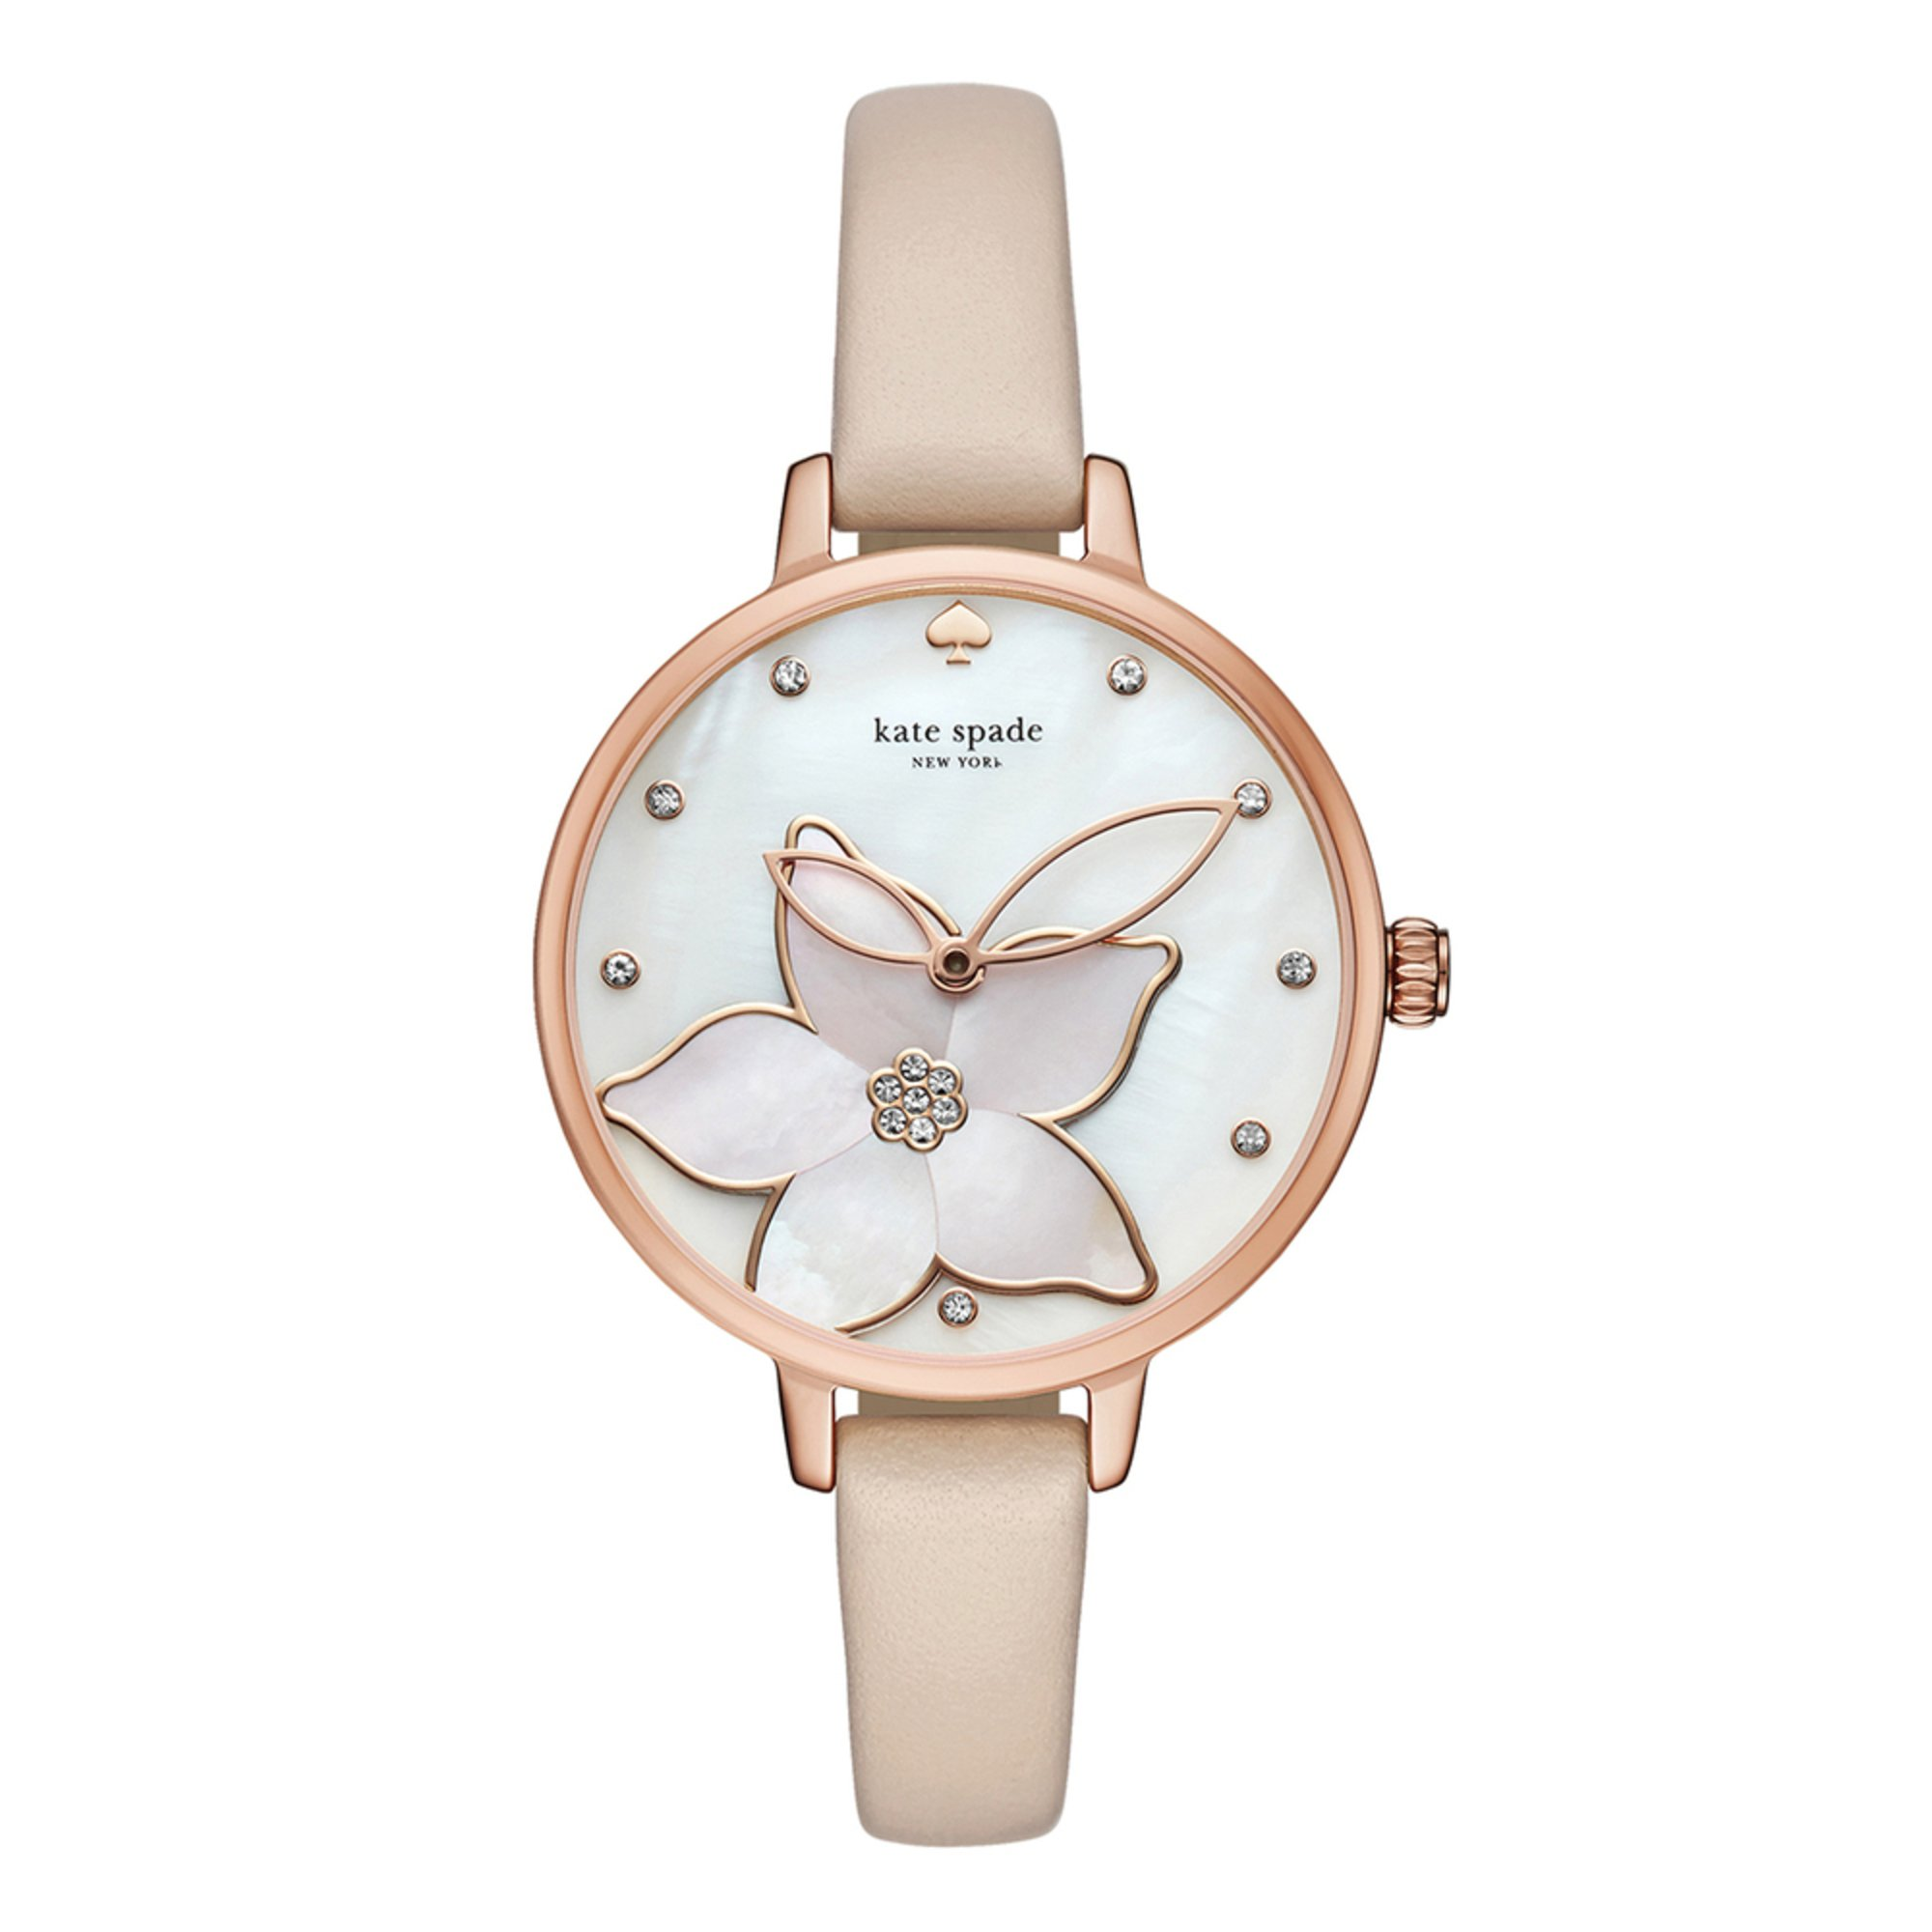 3b6391a6fba Kate Spade New York. Kate Spade New York Metro Flower Vachetta Leather Watch  ...